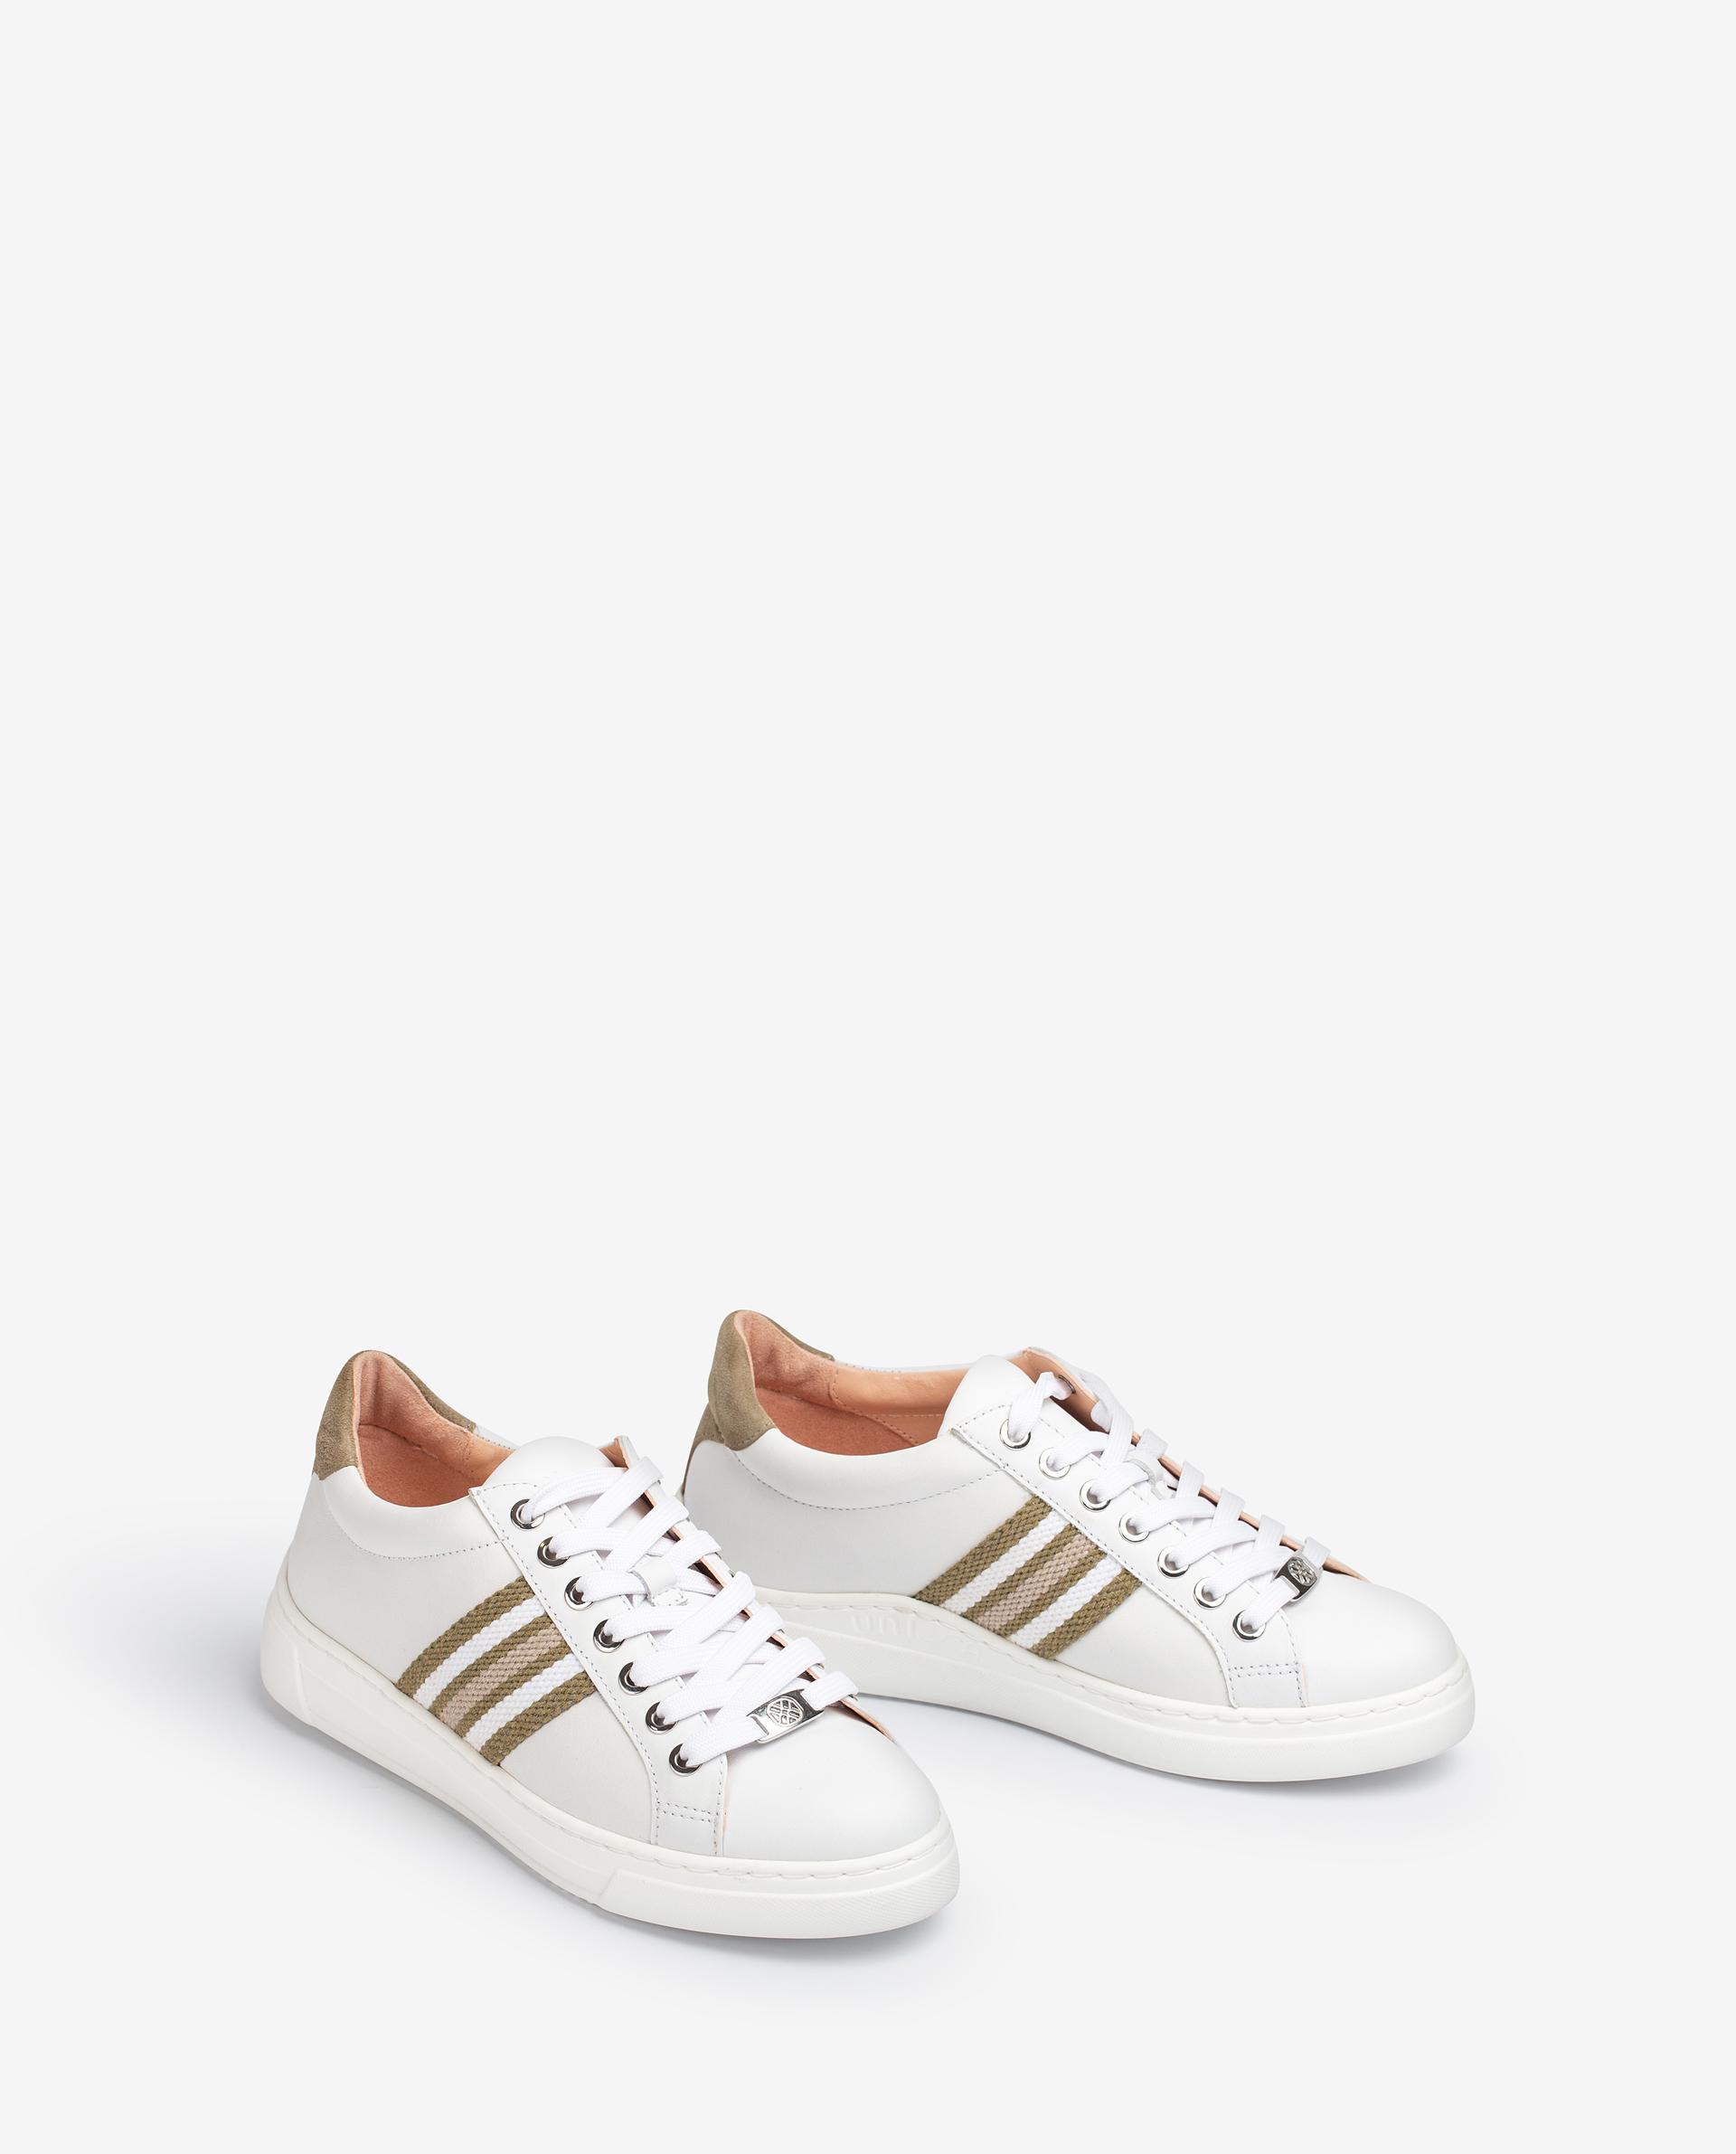 Unisa Chaussures de sport FAROLA_21_NF WHTE/LAURO